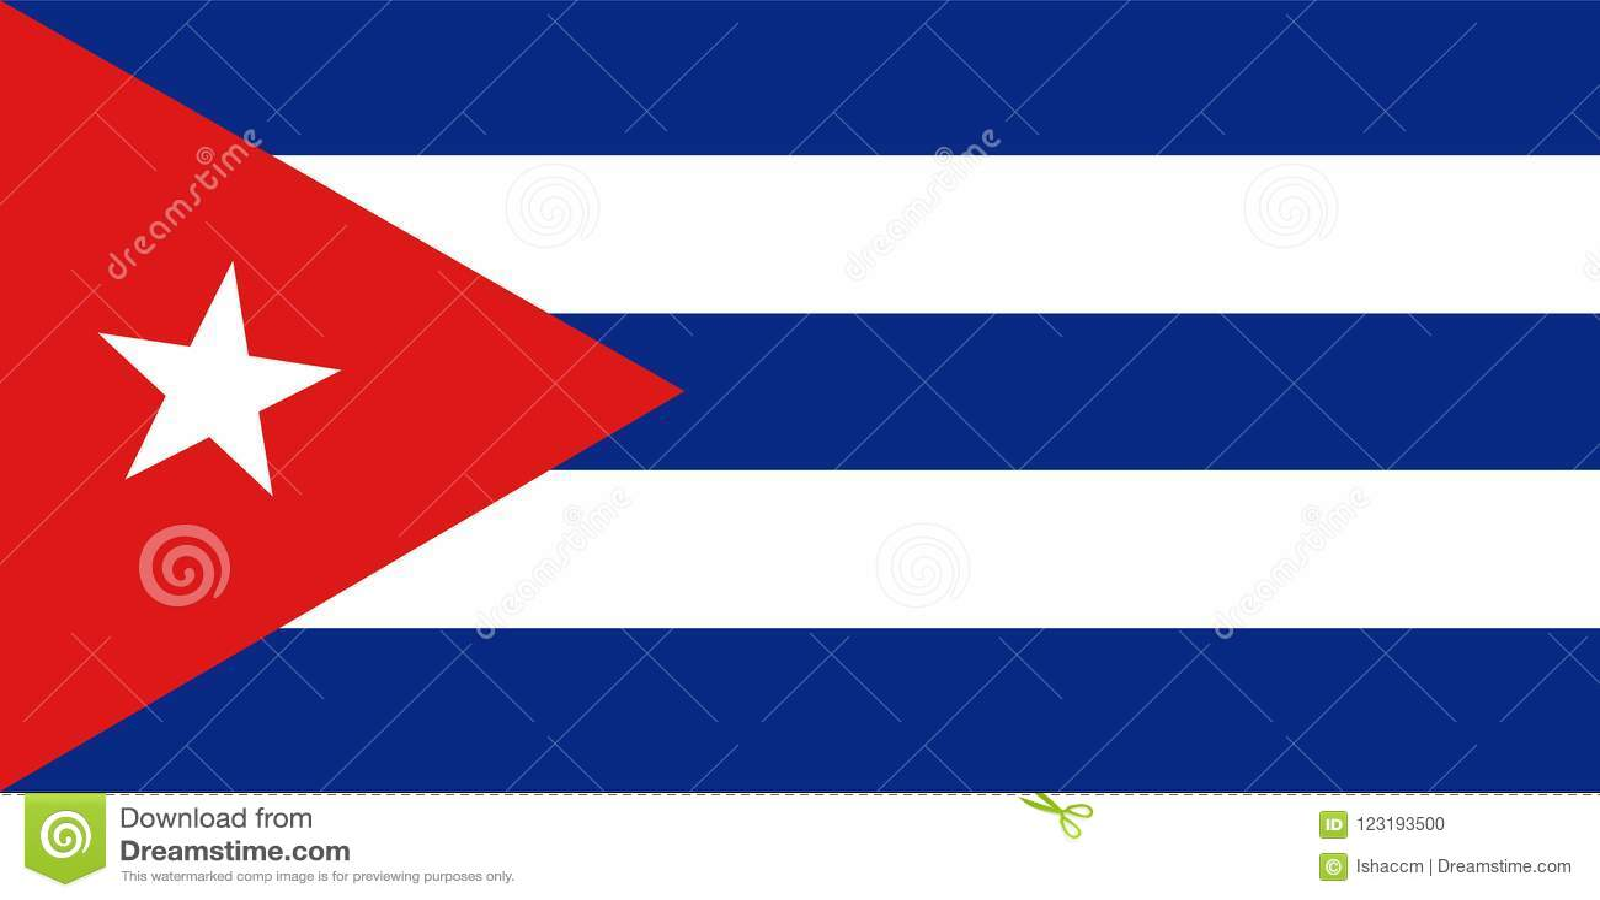 Kuba flaga wektor Ilustracja Kuba flaga